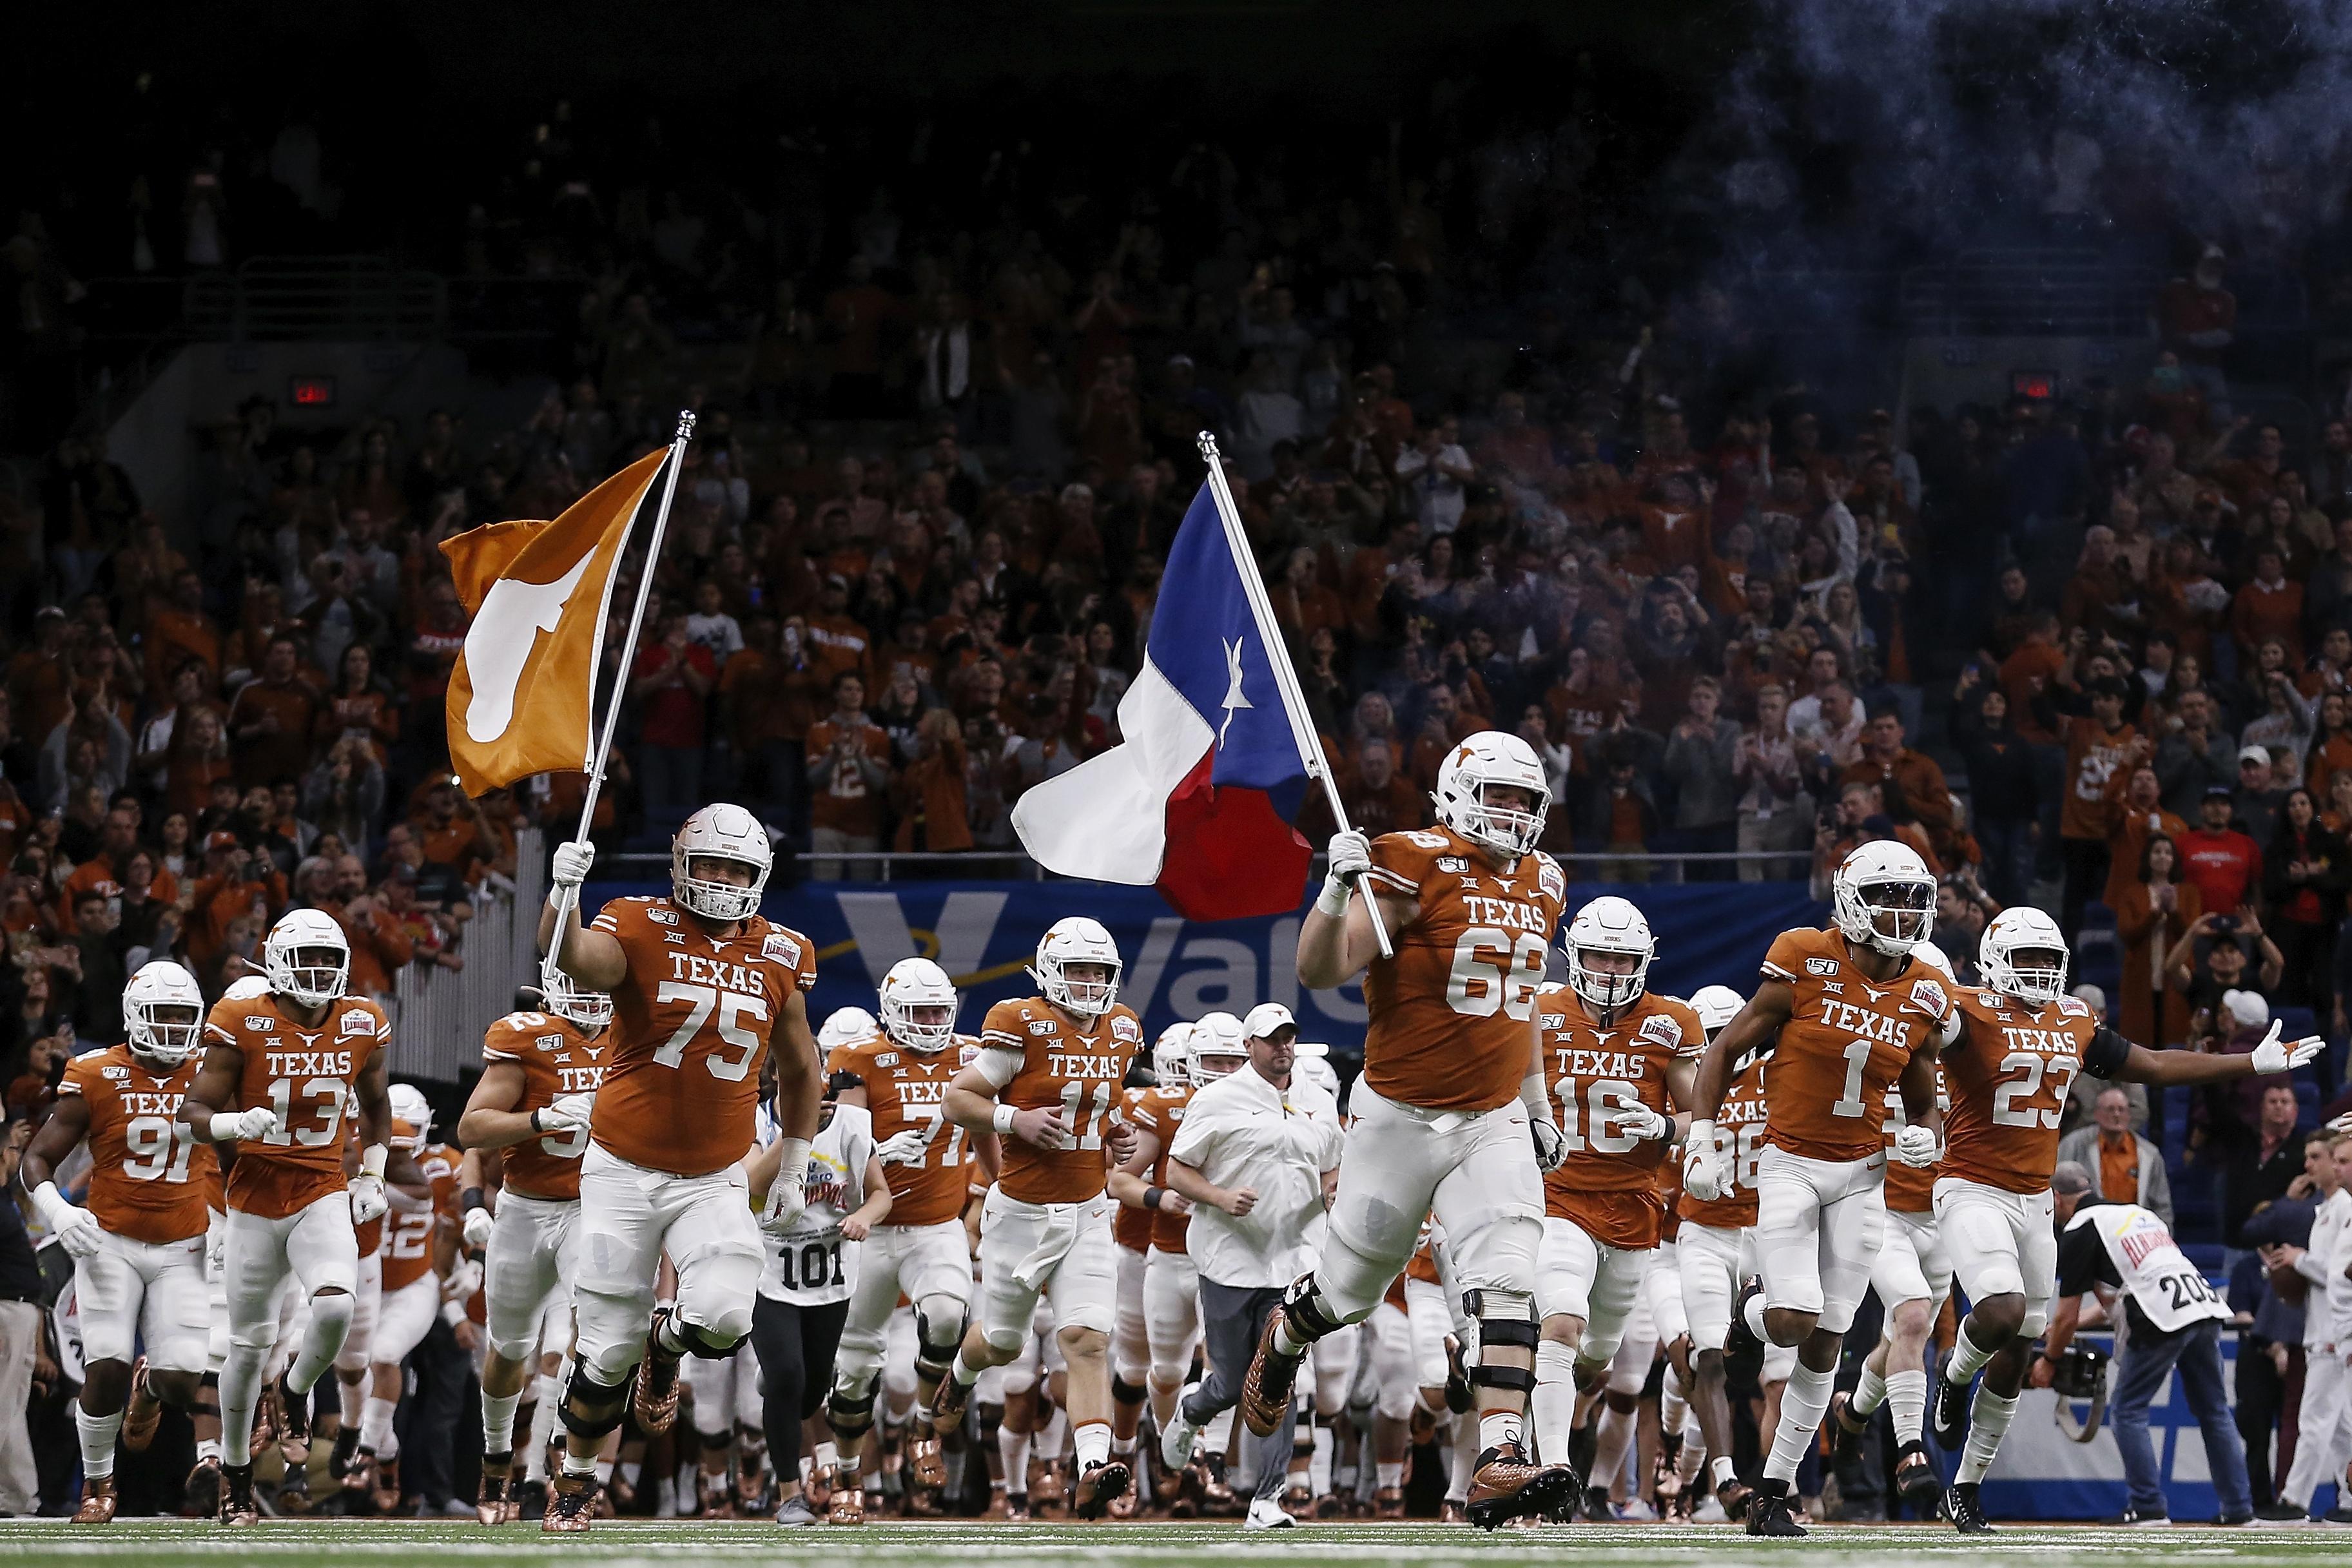 Valero Alamo Bowl - Utah v Texas